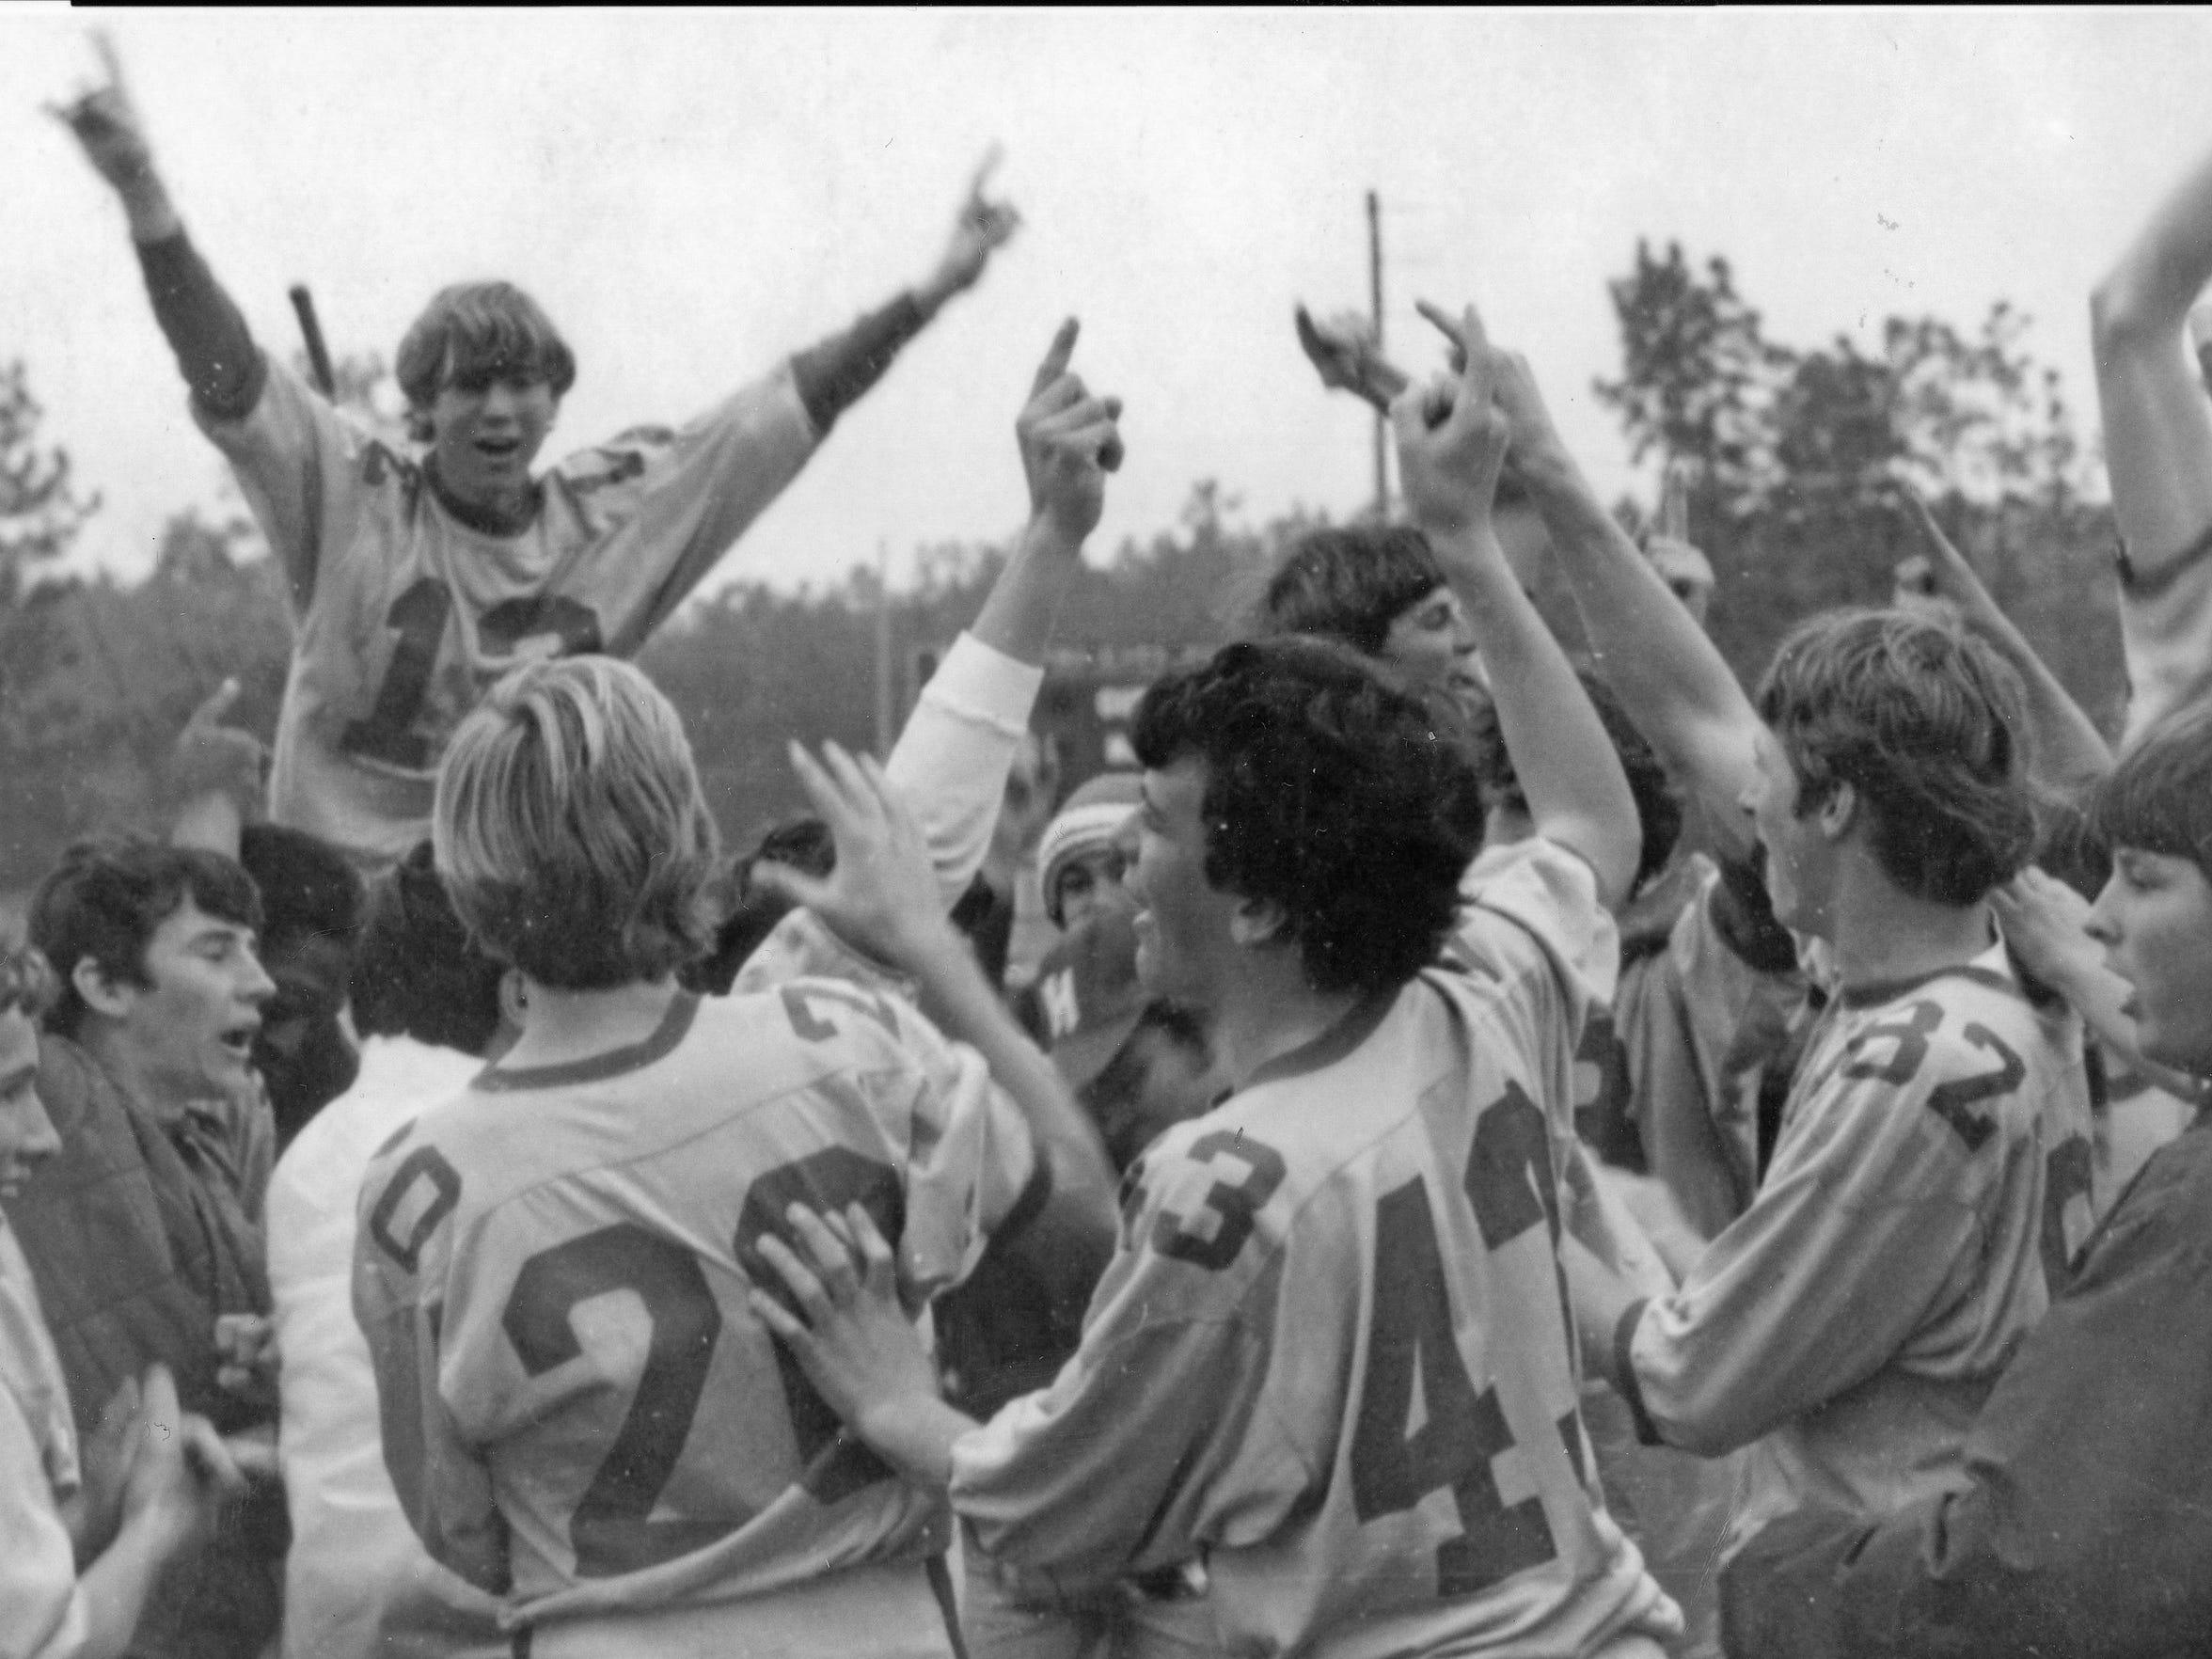 The Wade Hampton soccer team celebrates after winning